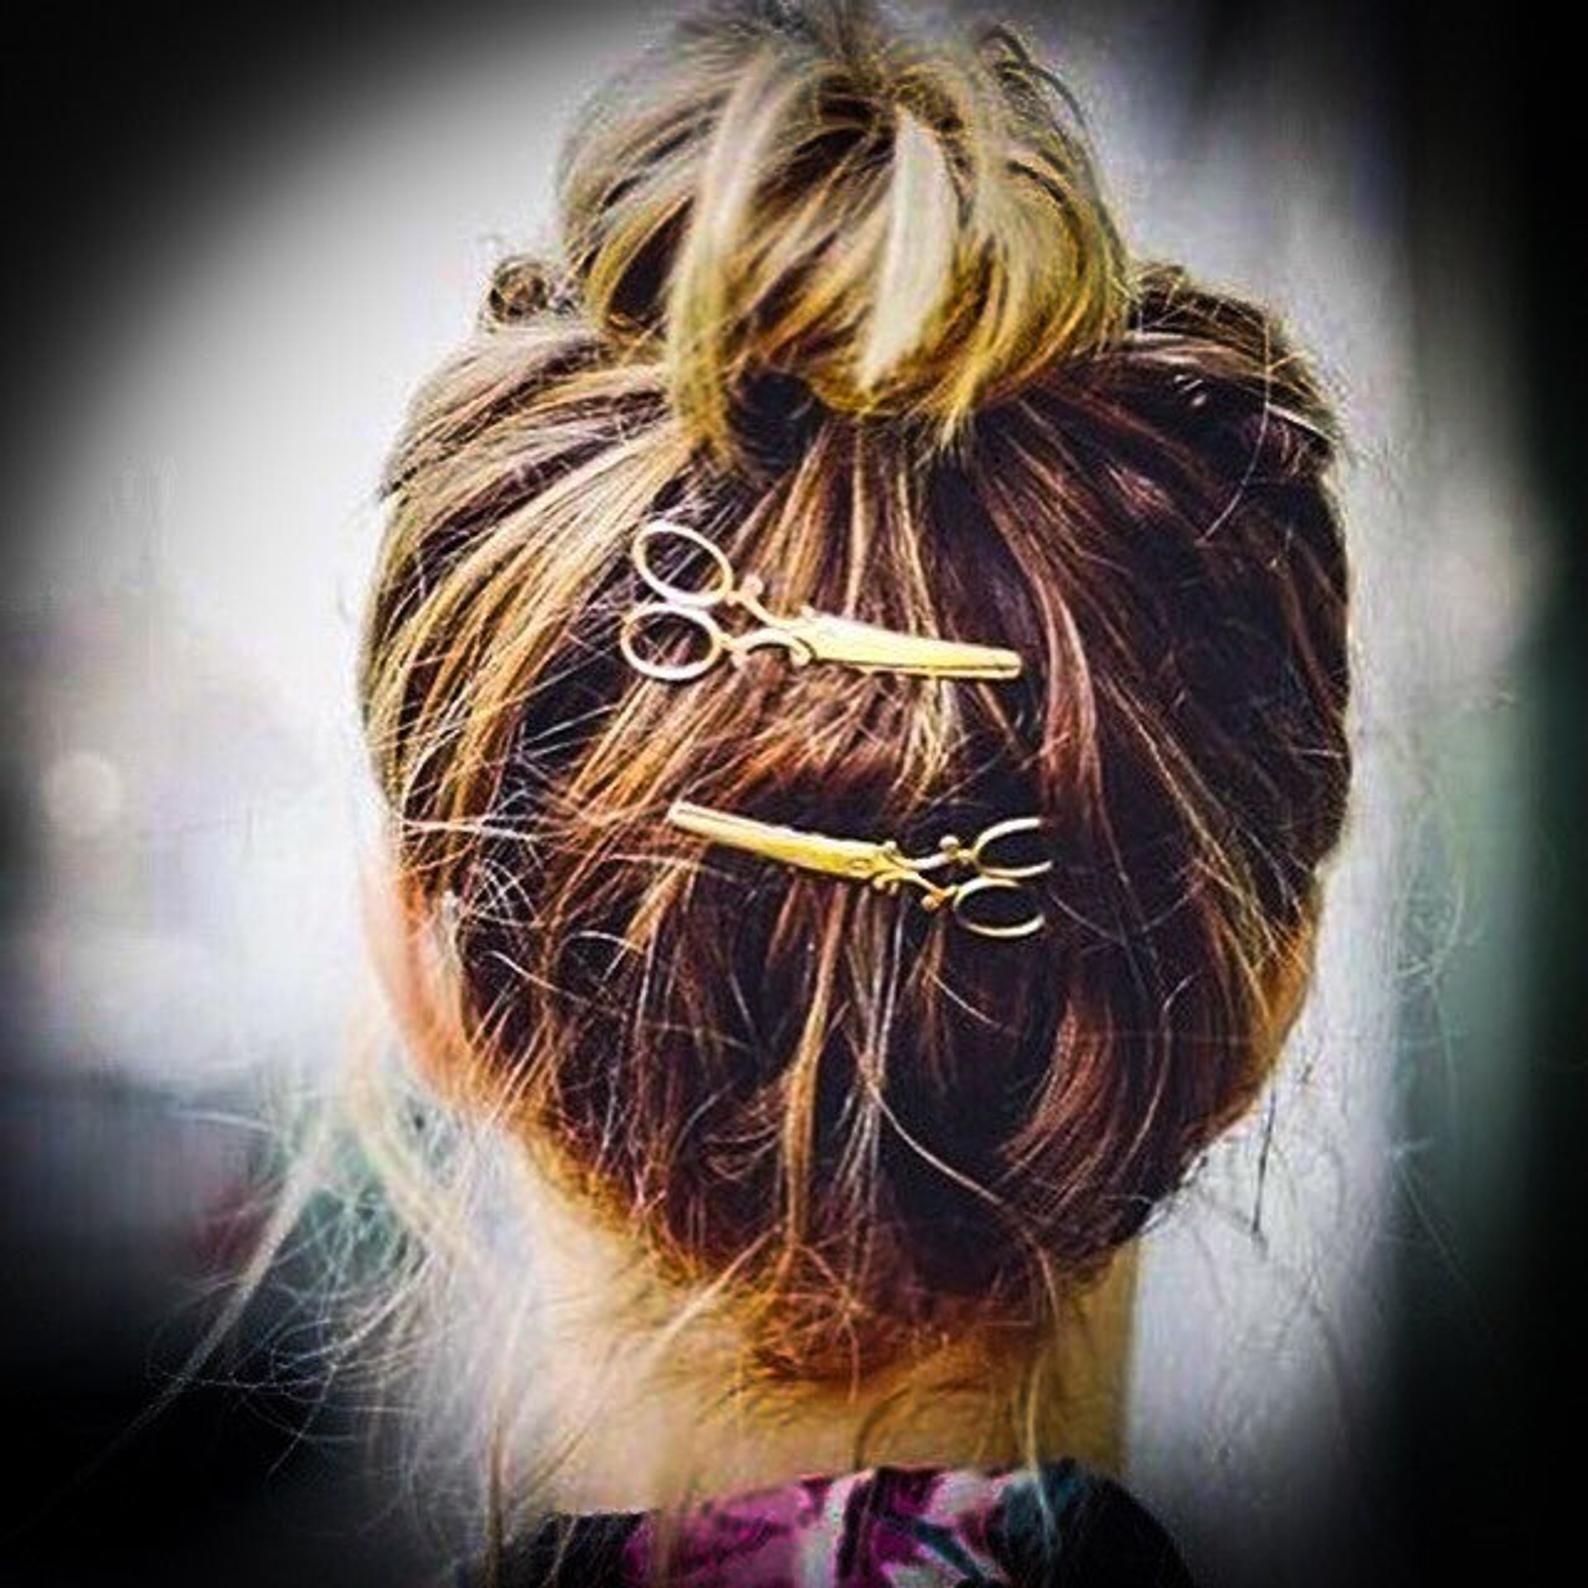 Scissor hair clips 2 clips | Etsy